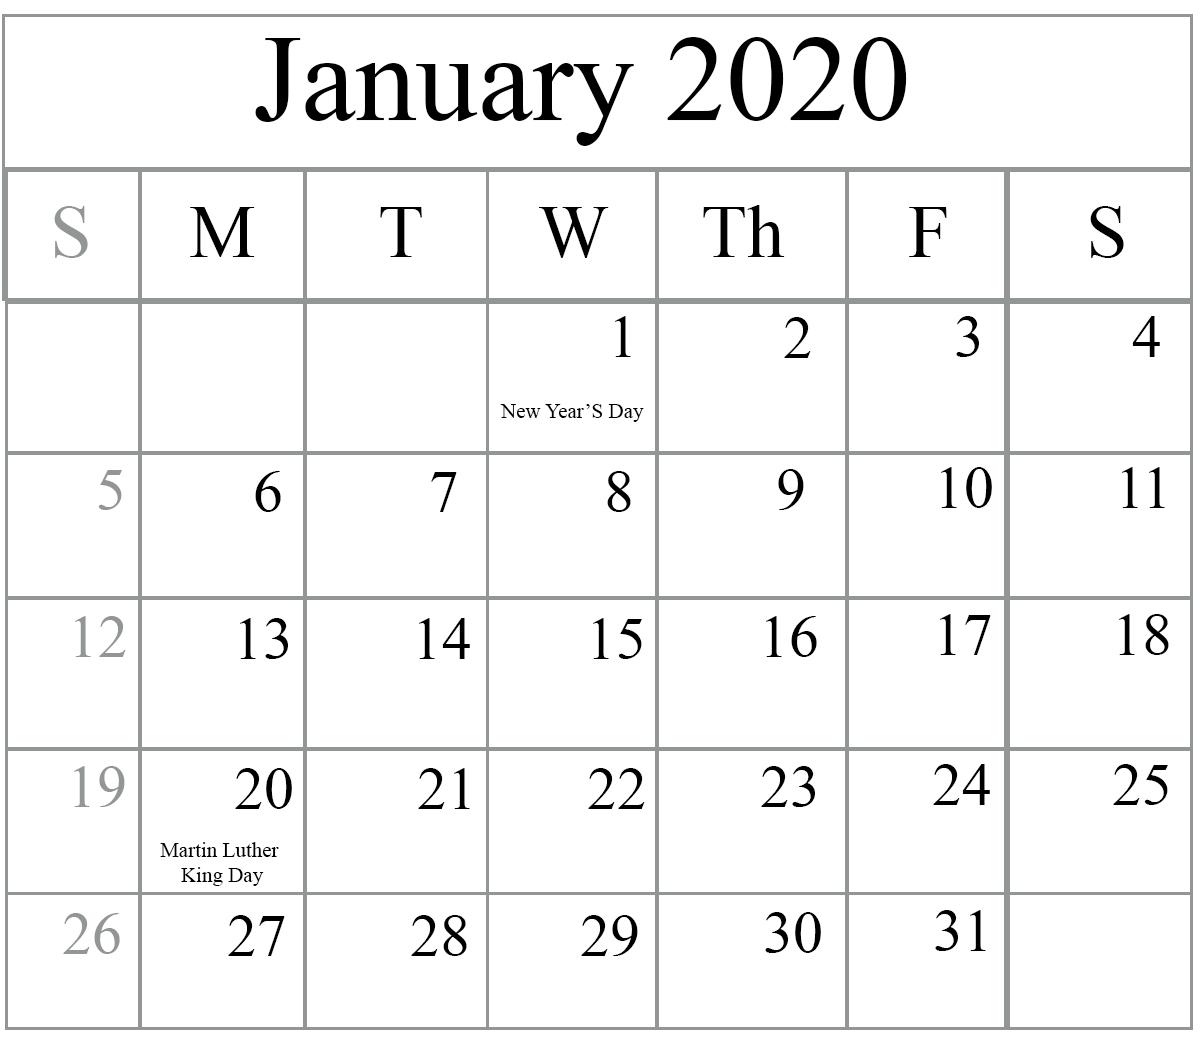 2020 Calendar I Can Edit   Calendar Template Printable Blank Calendar That I Can Edit